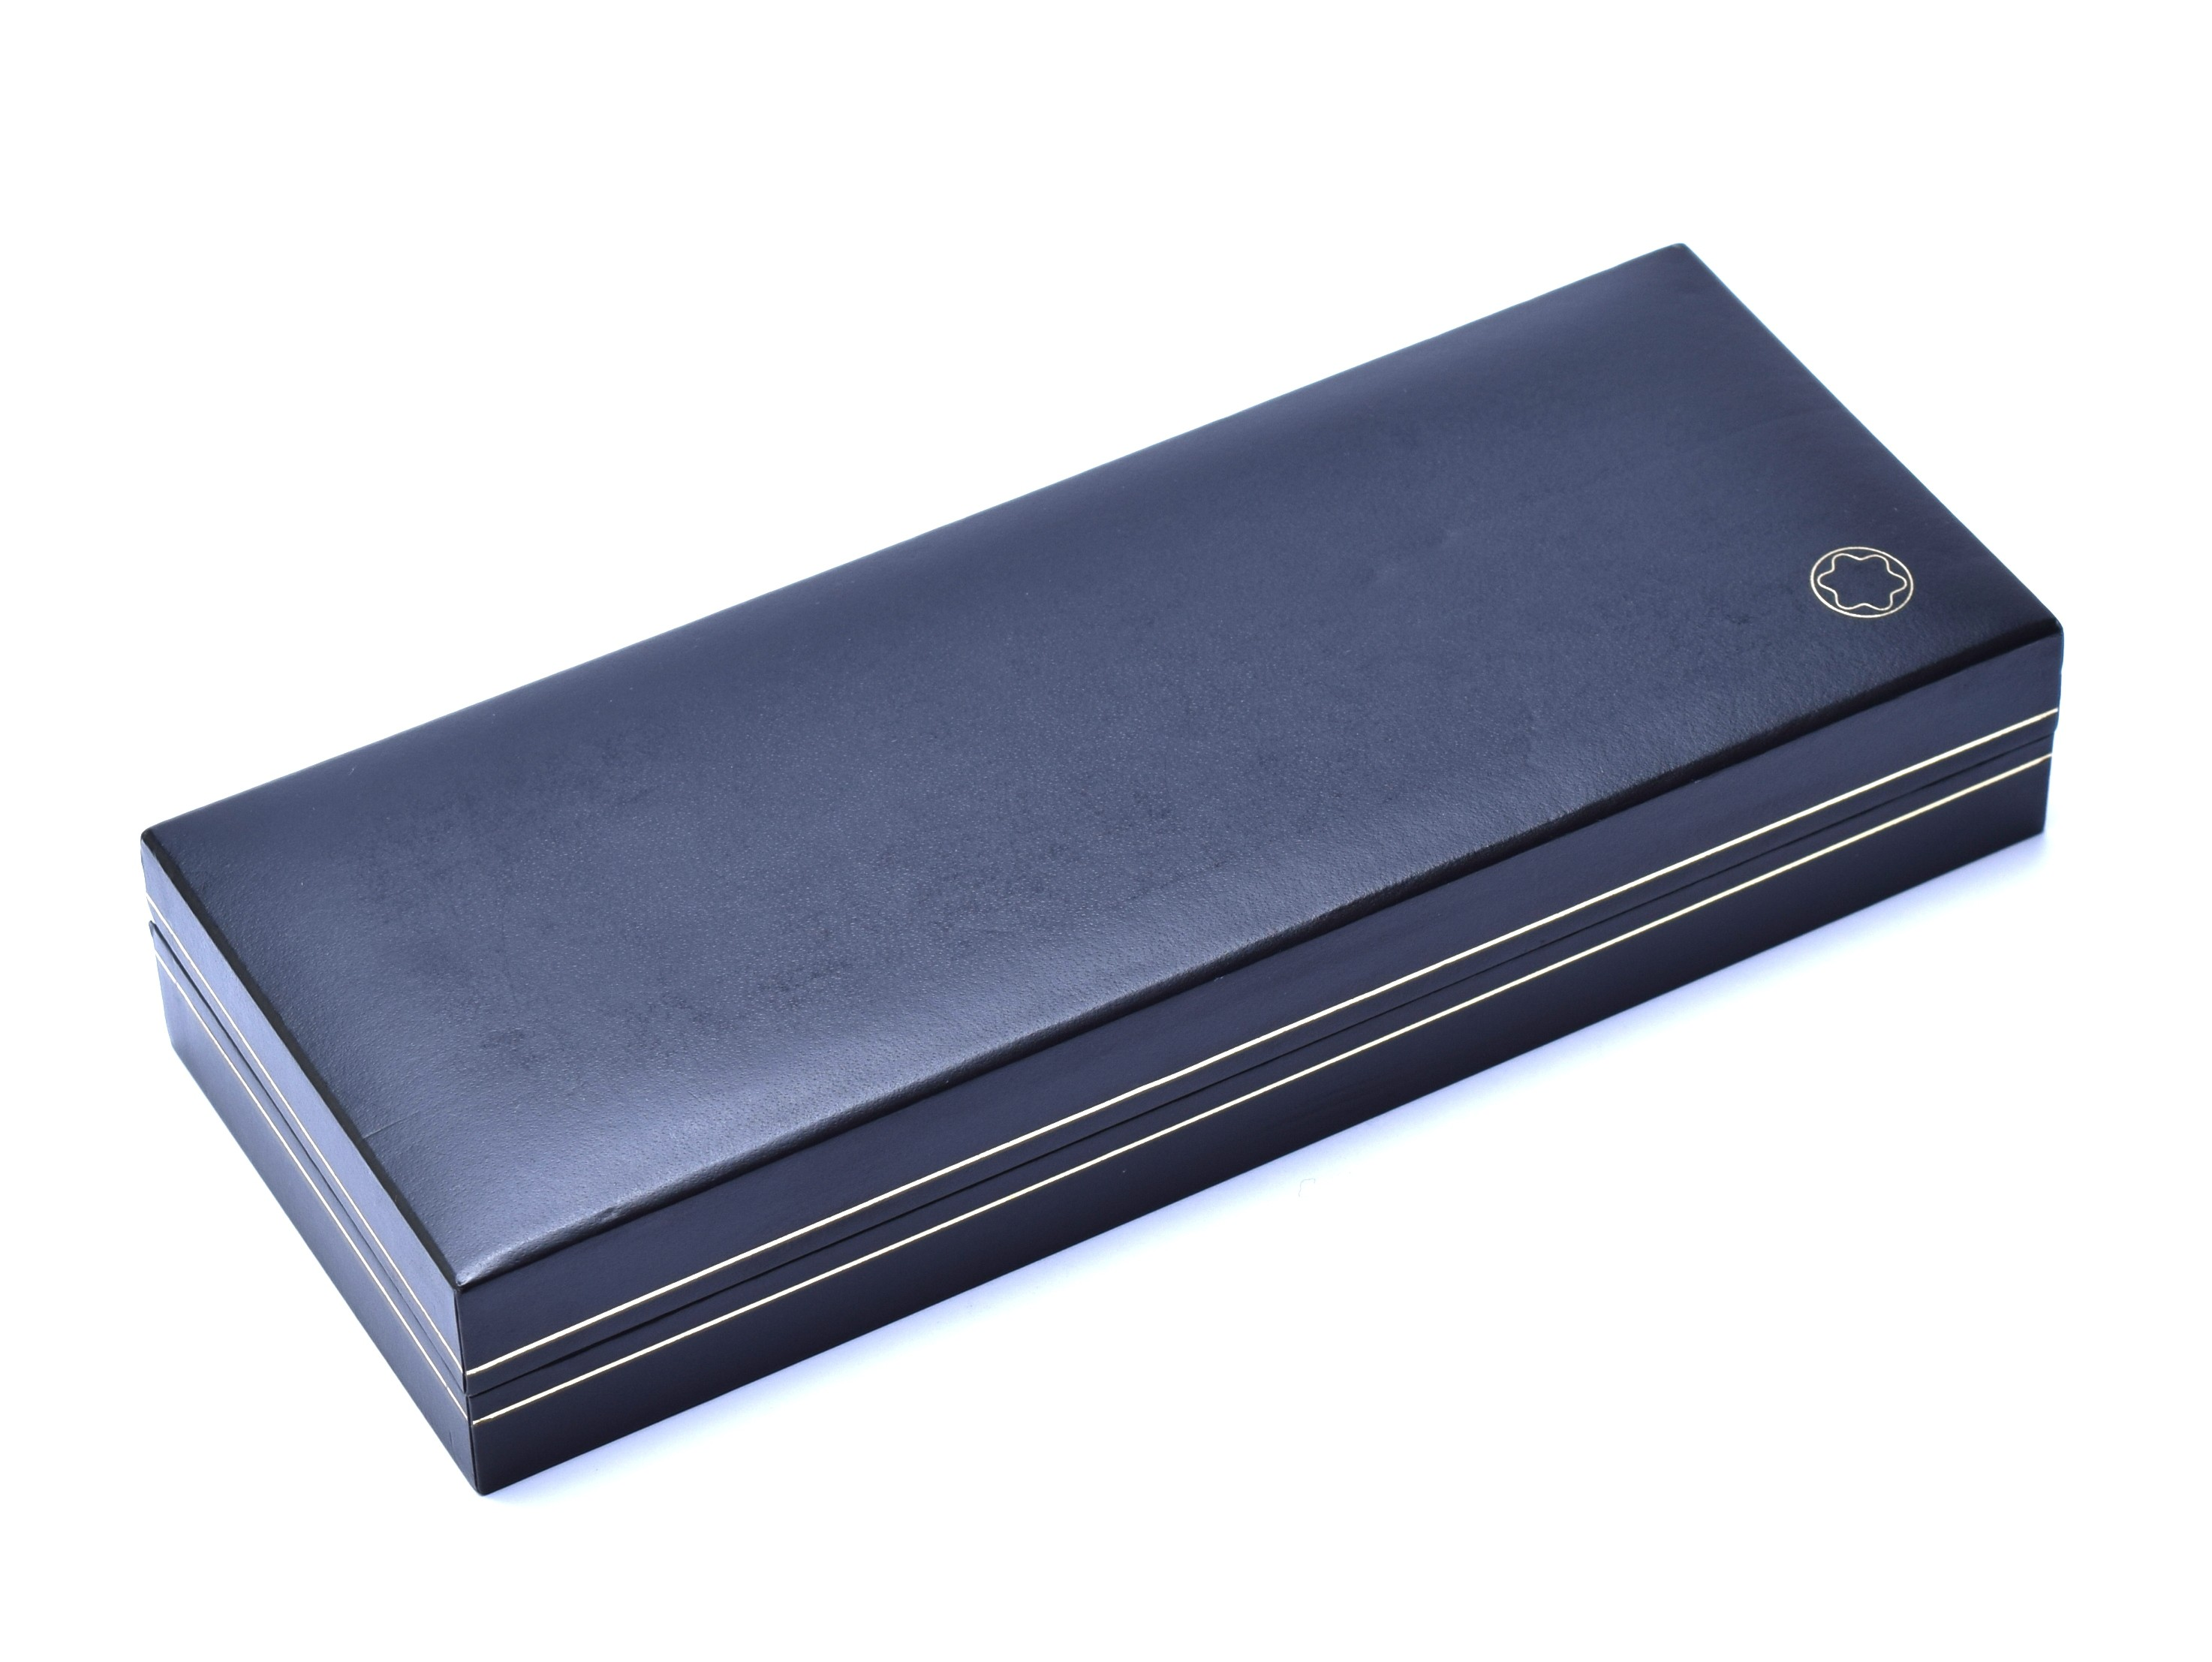 e5290989551b Pen Boxes at Penn State Industries